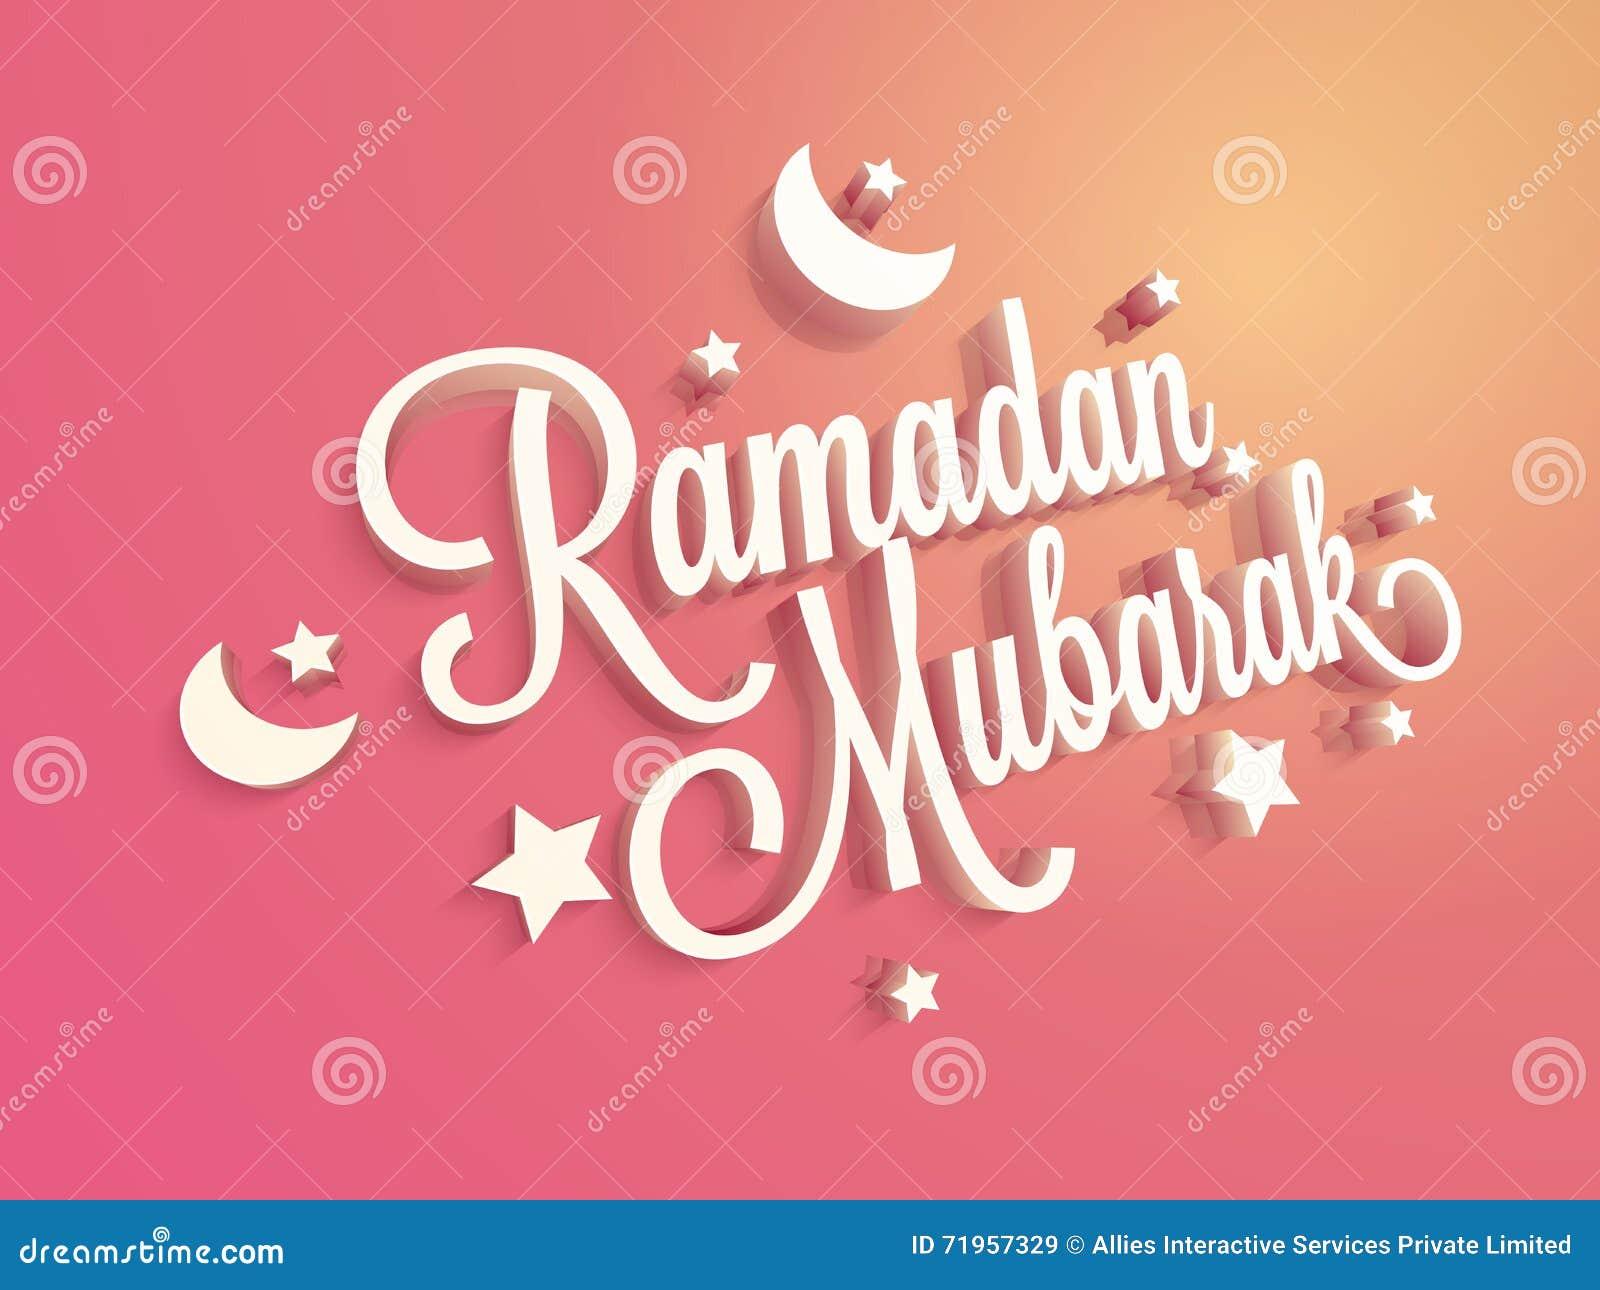 3d text for ramadan mubarak stock illustration illustration of